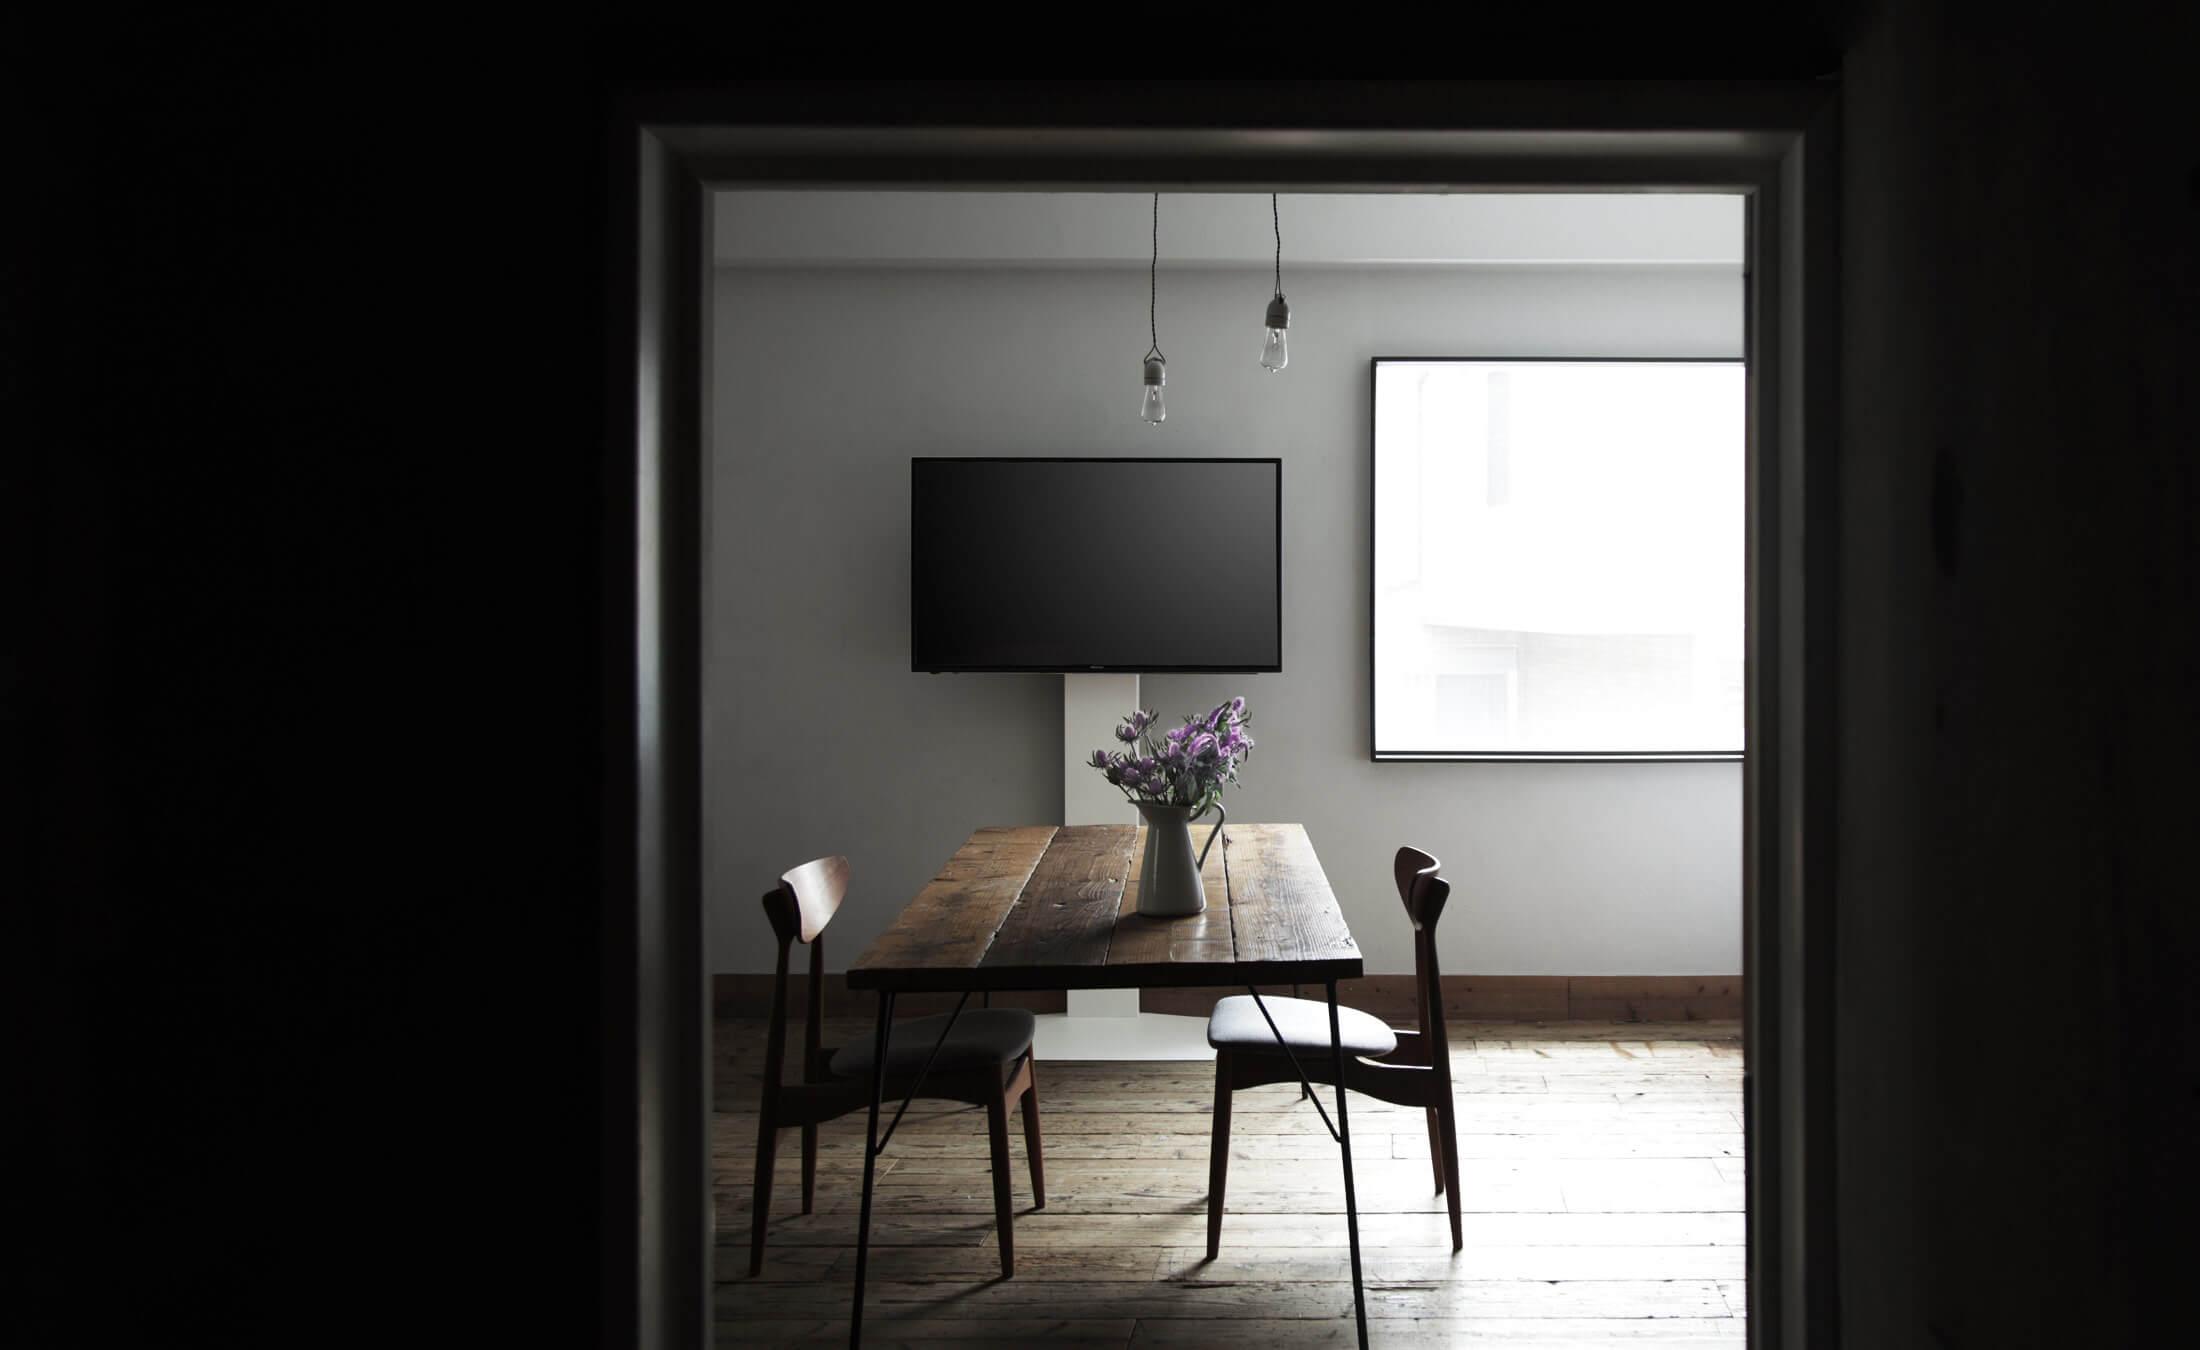 WALL INTERIOR TV STAND V3 壁寄せテレビスタンドV3 LIVING ROOM 1枚目